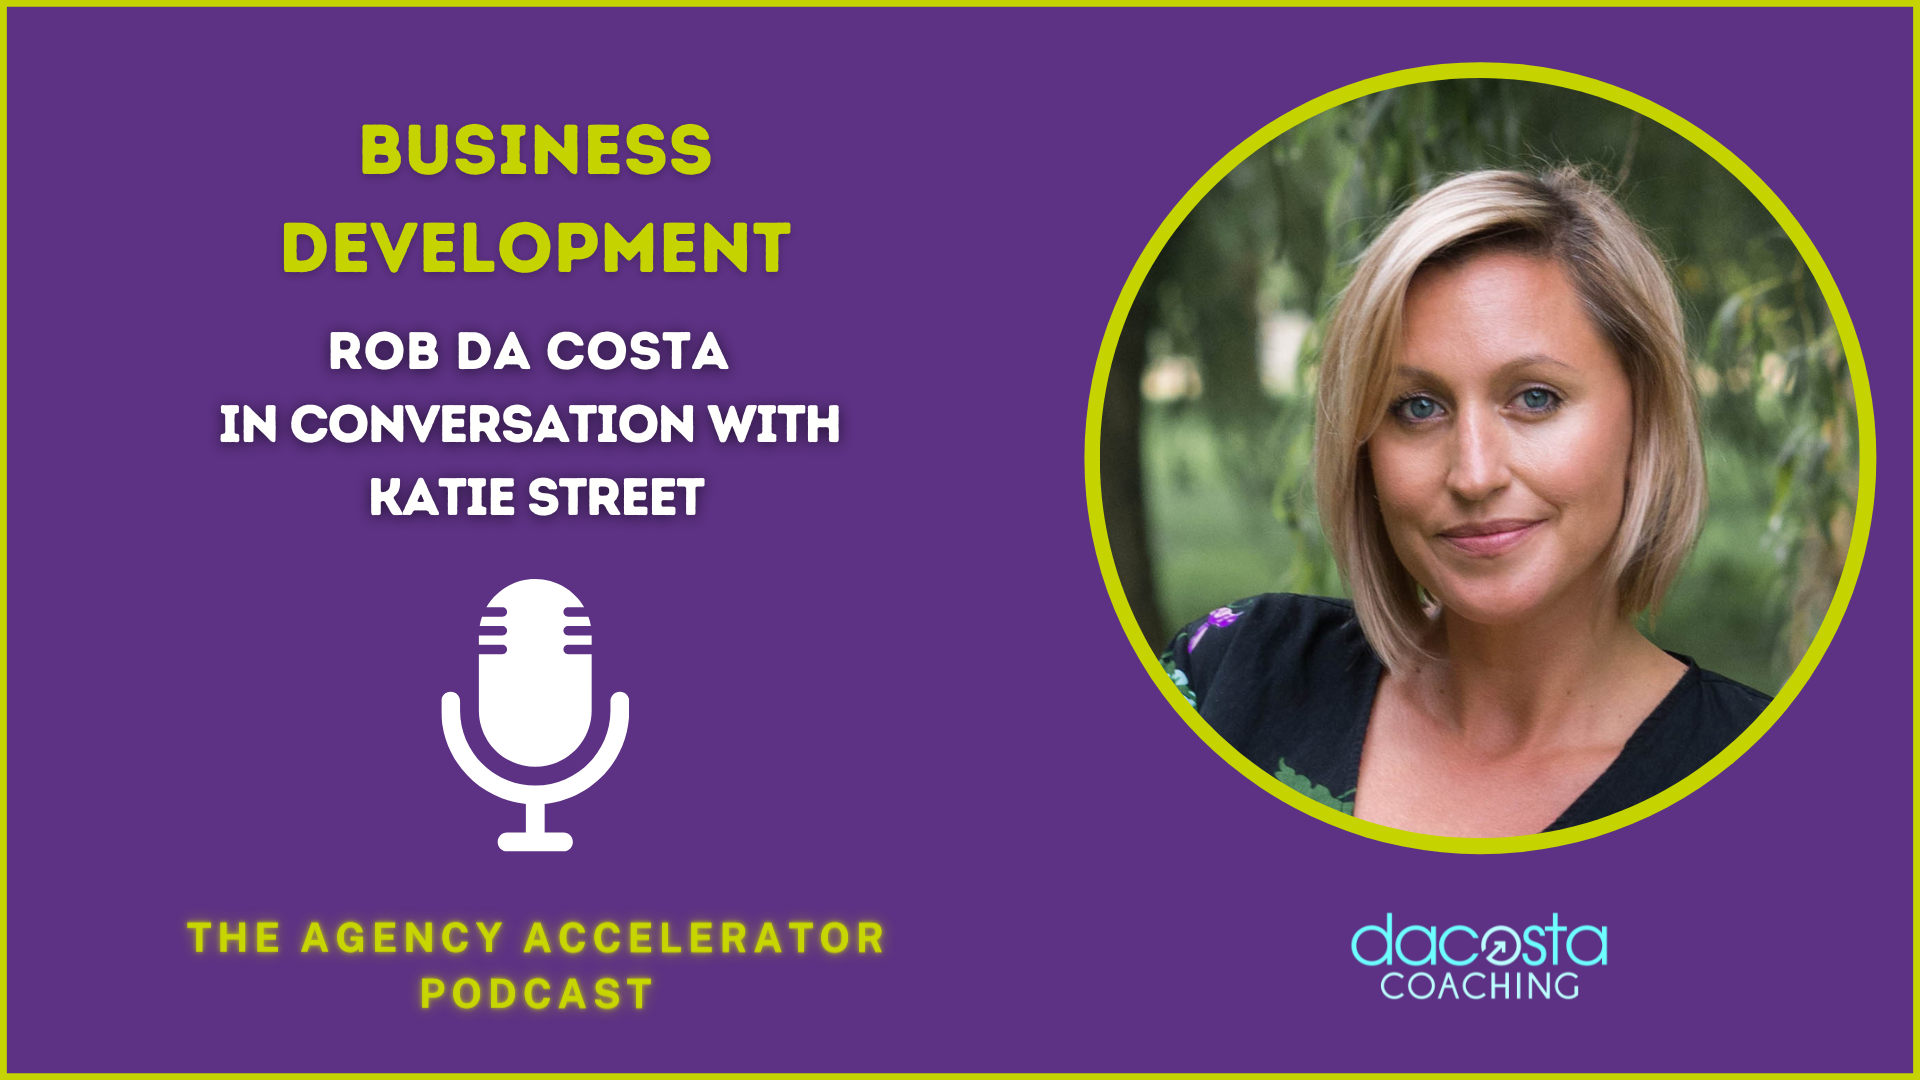 Business Development with Katie Street